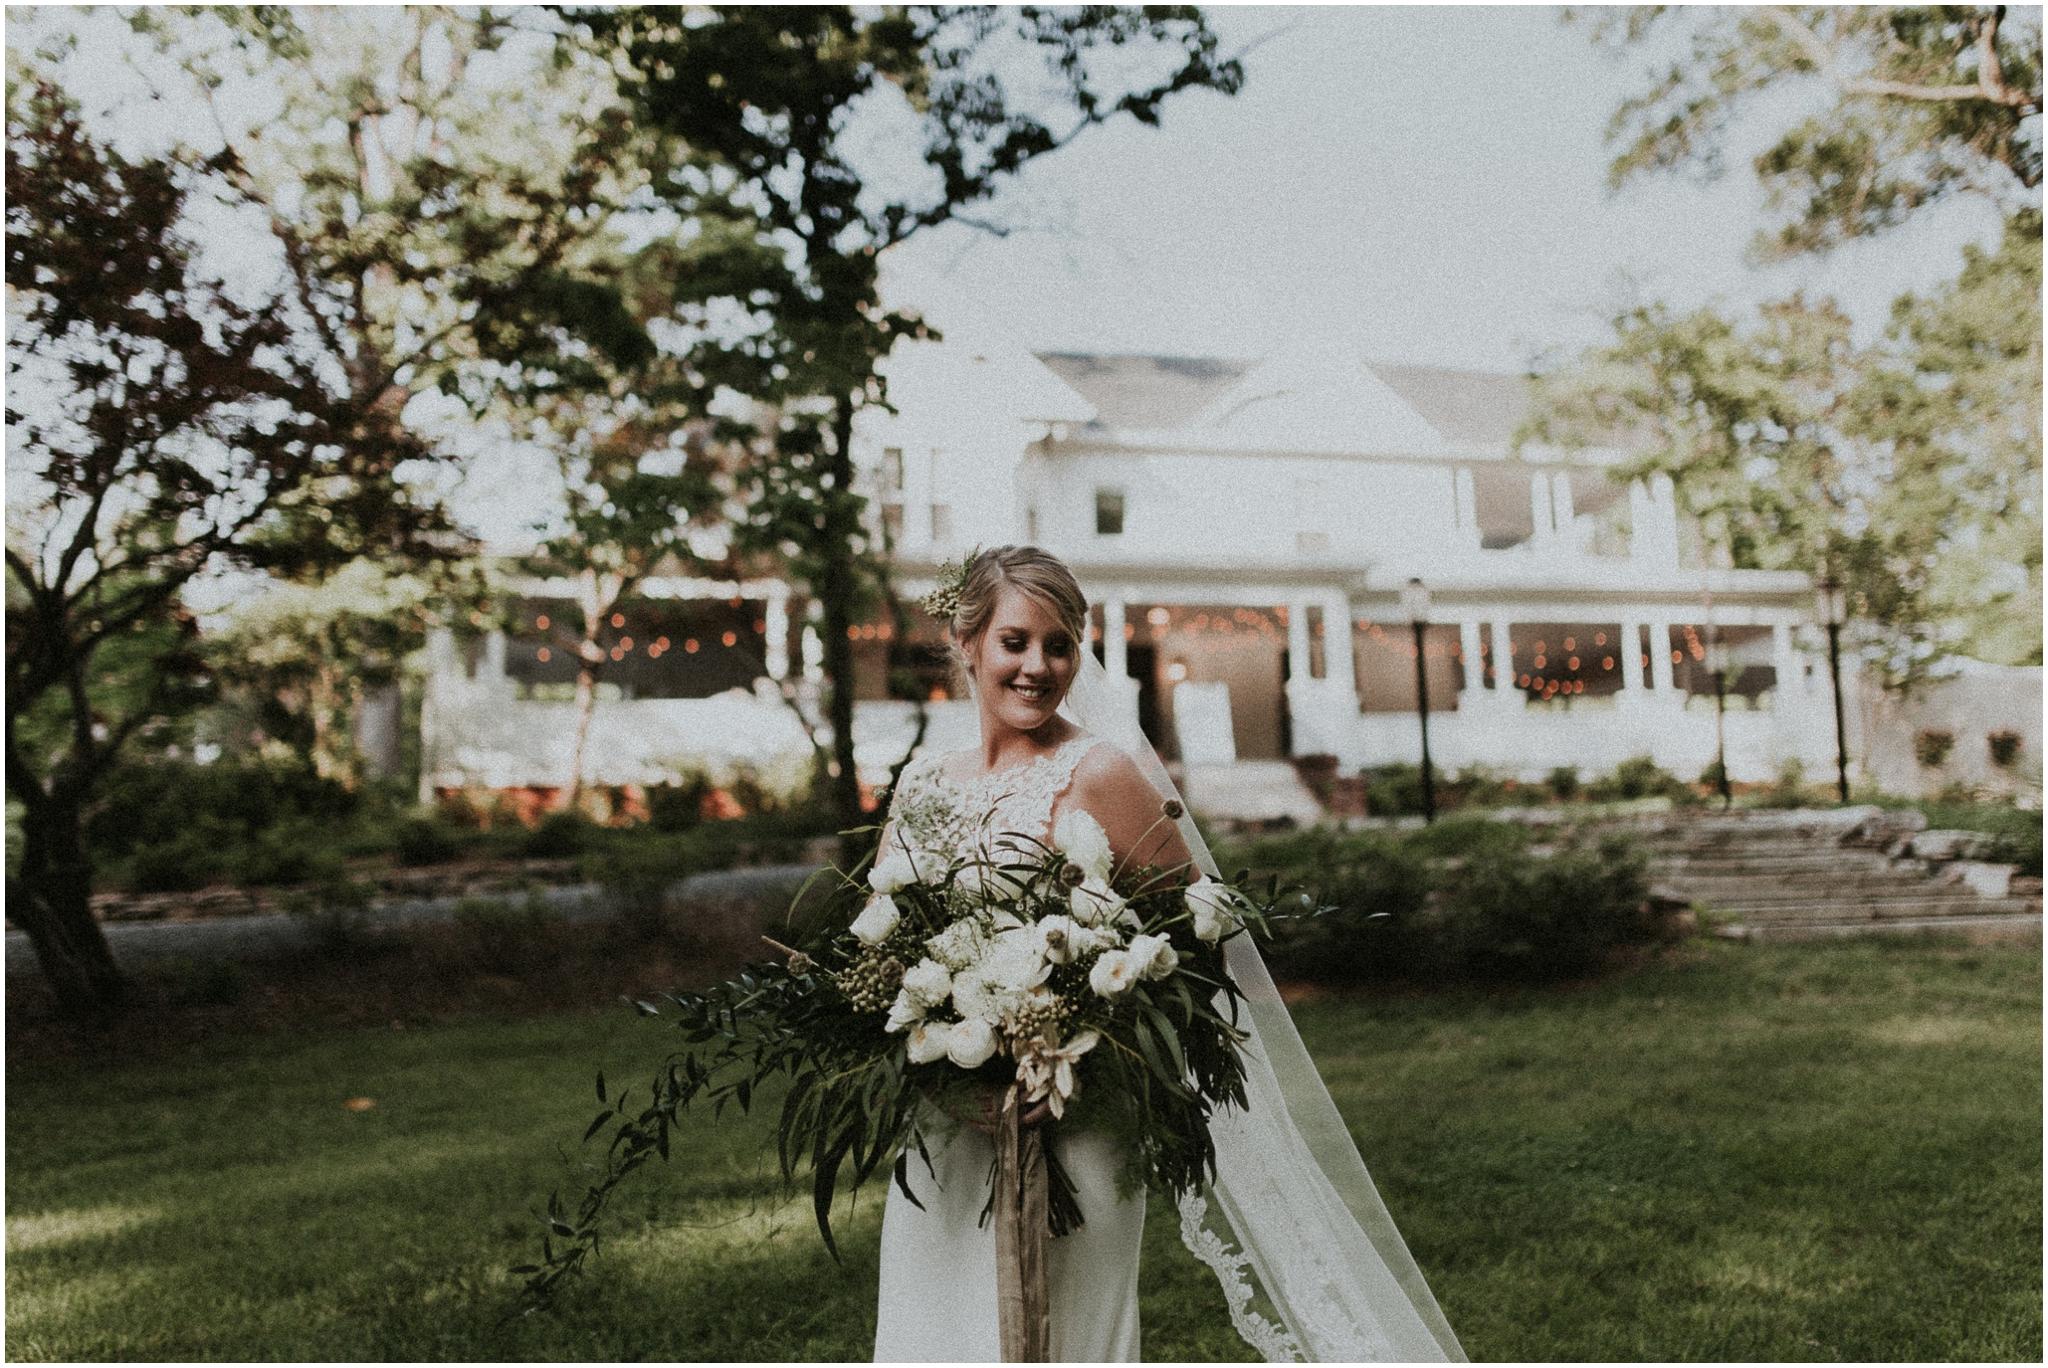 Wedding-photographer-ritchie-hill_0022.jpg